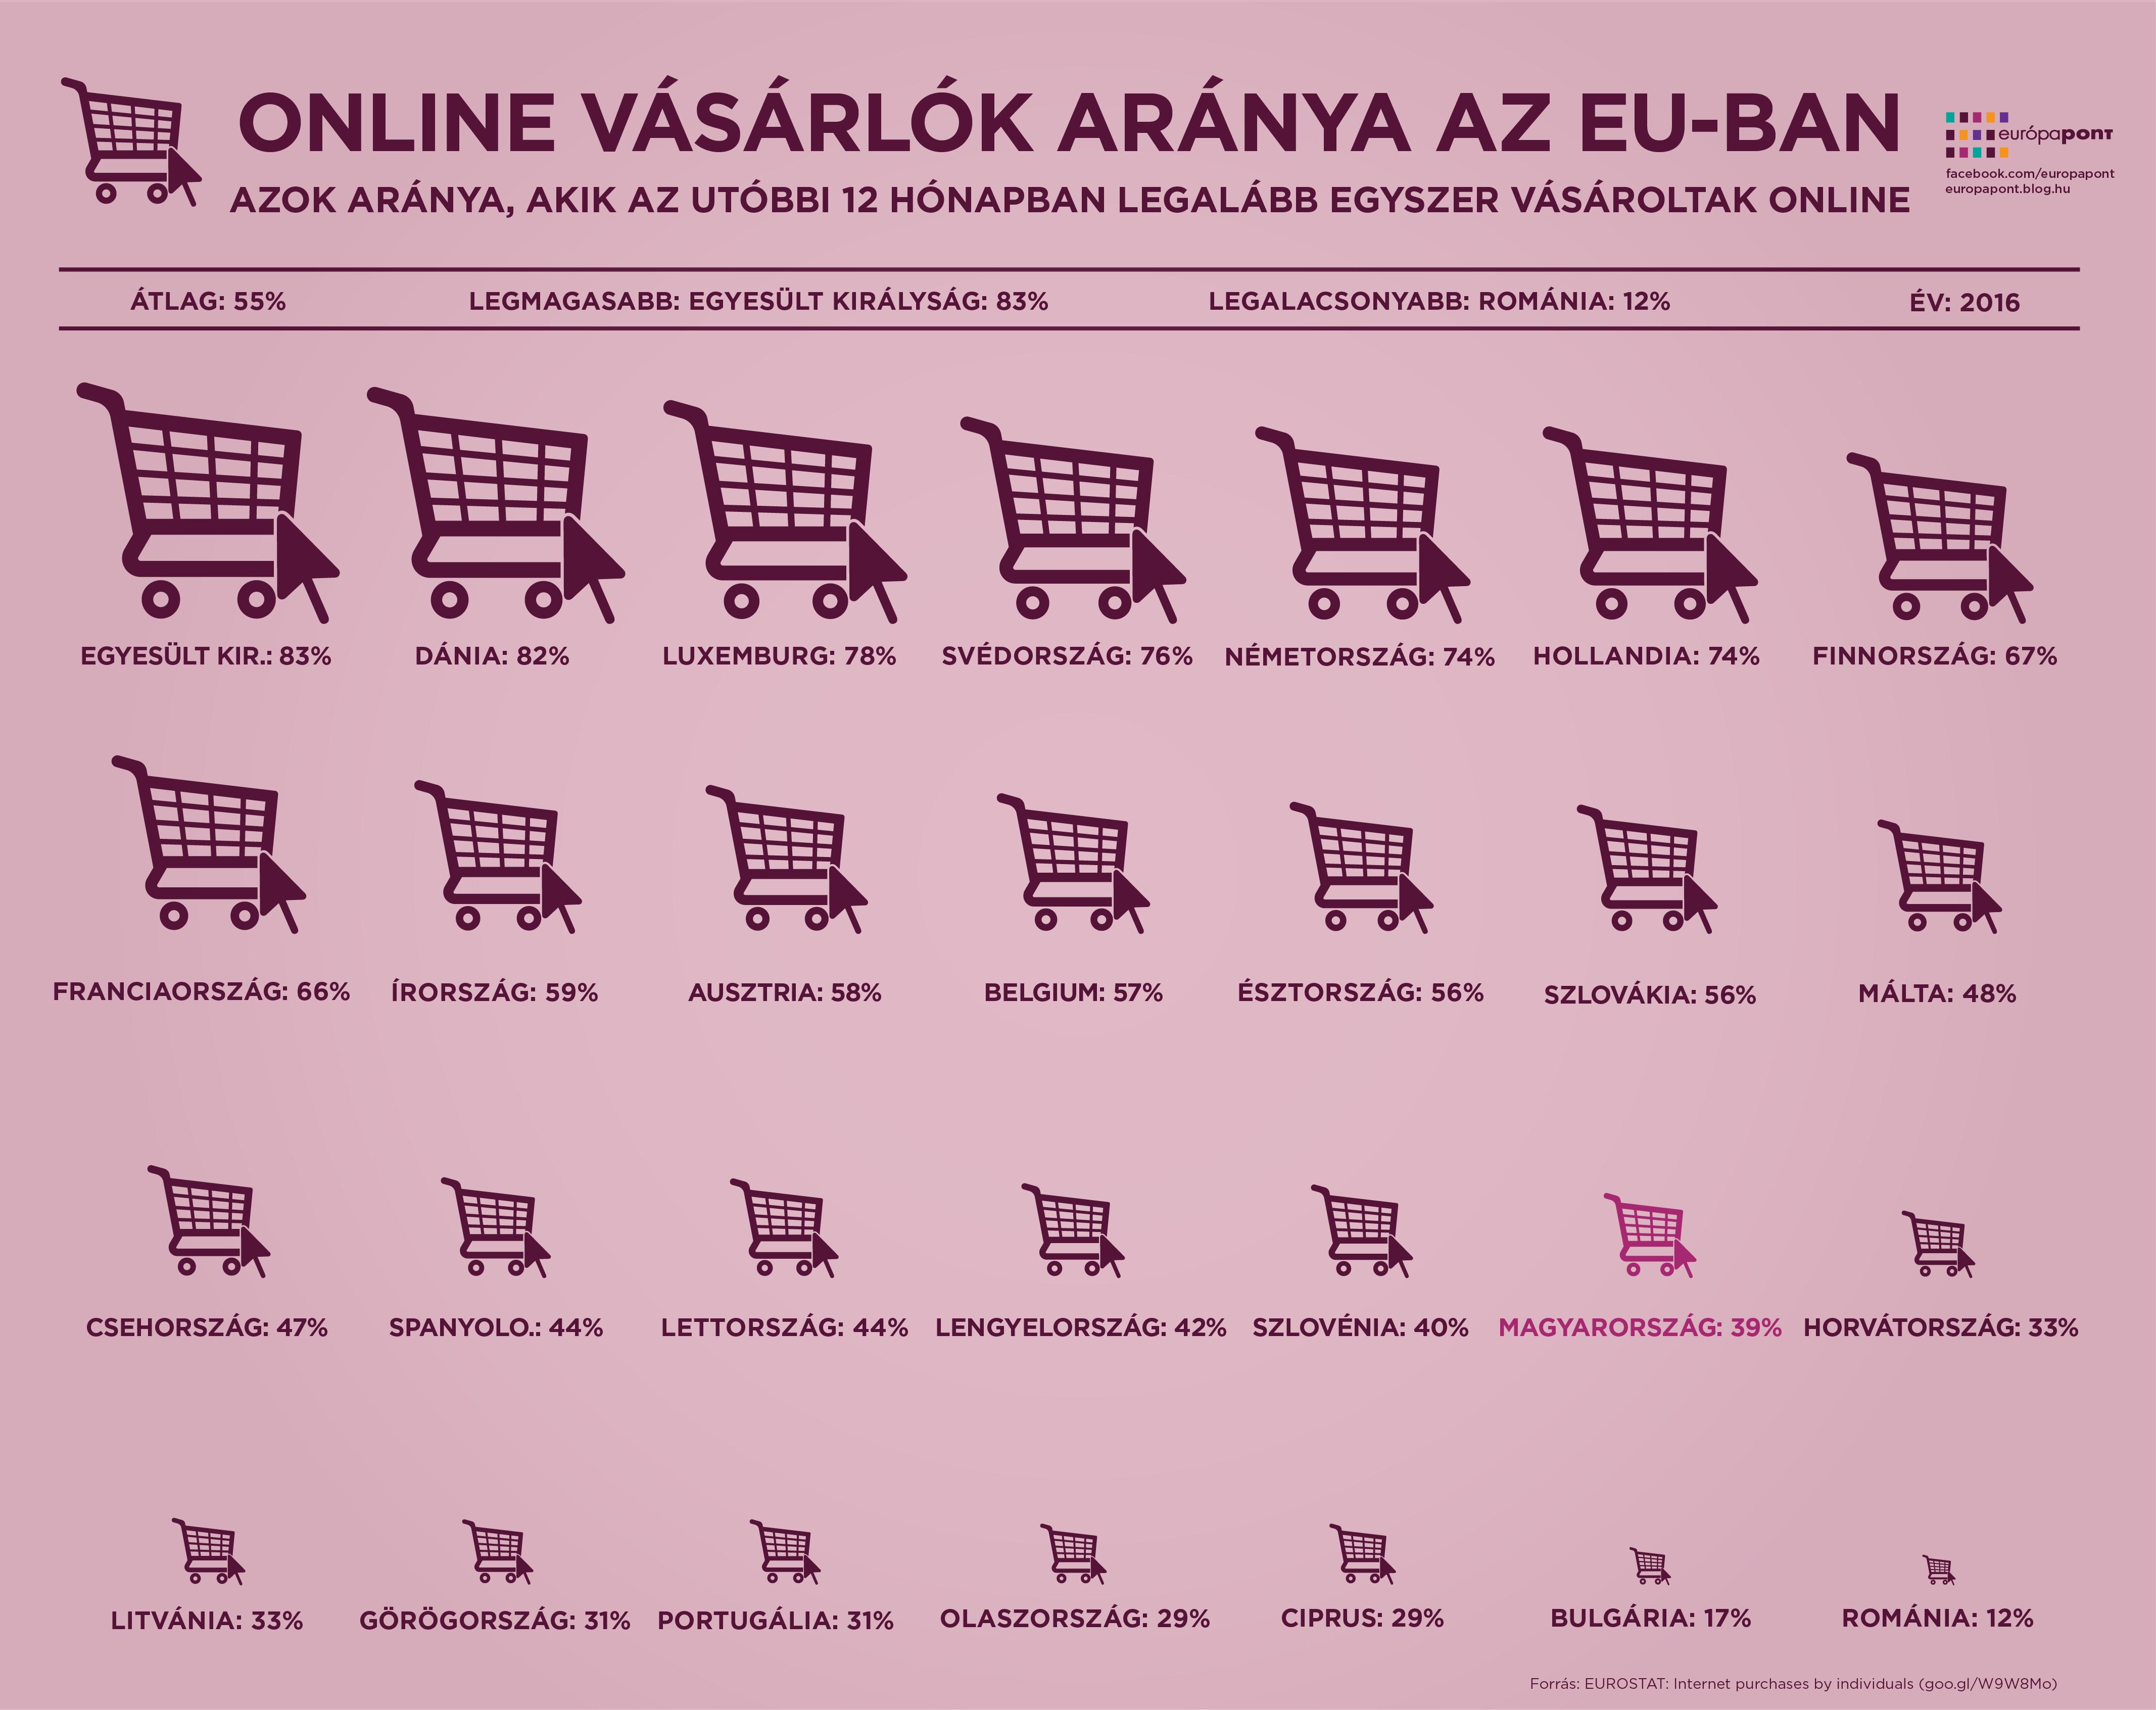 europa_szamokban_online_shopping-01.png